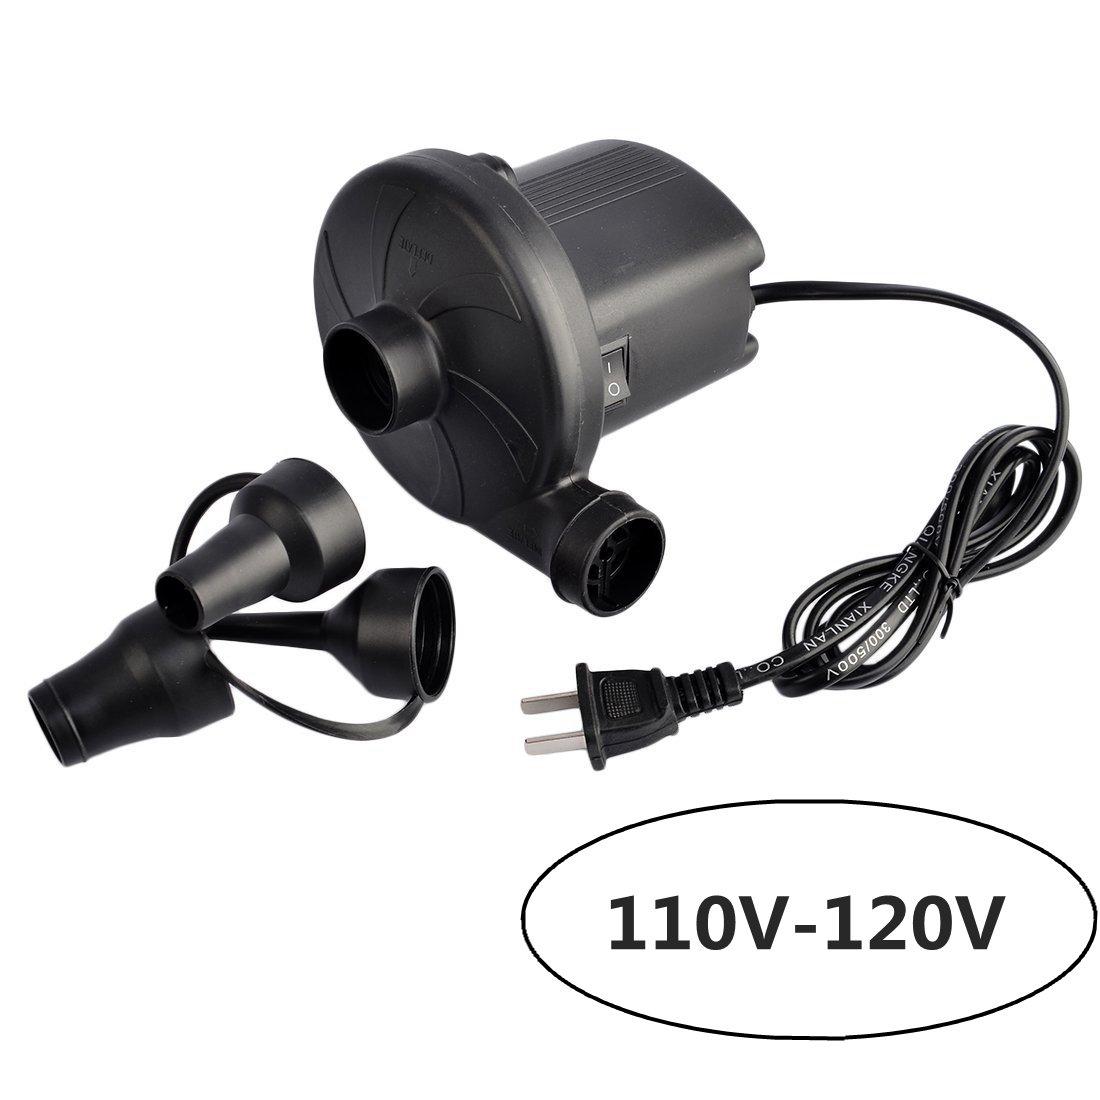 Air Pumps, Petforu Quick-fill 110V-120V AC Electric Pump for Inflatable Bed /Pools /Mattress /Infant Swimming Ring